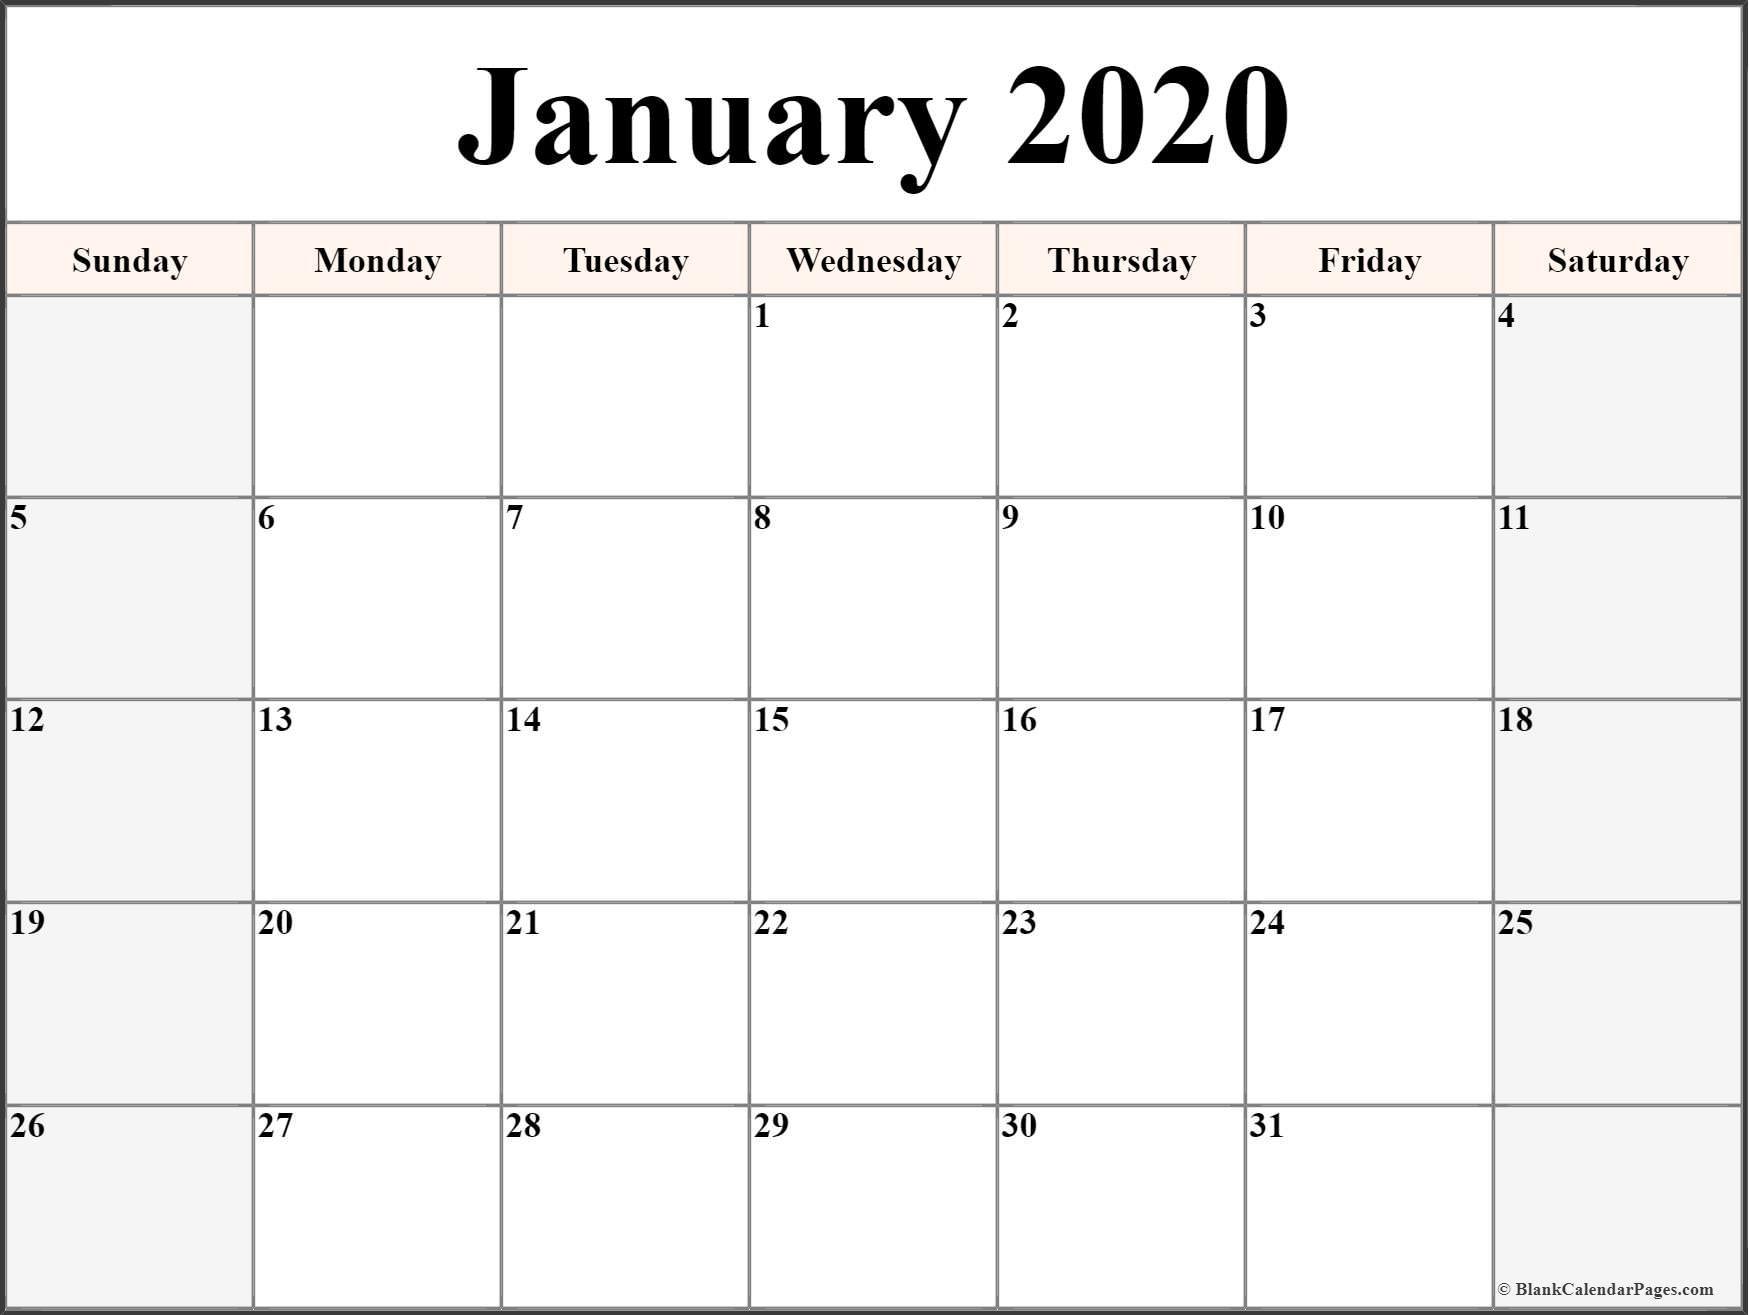 January 2020 blank calendar collection